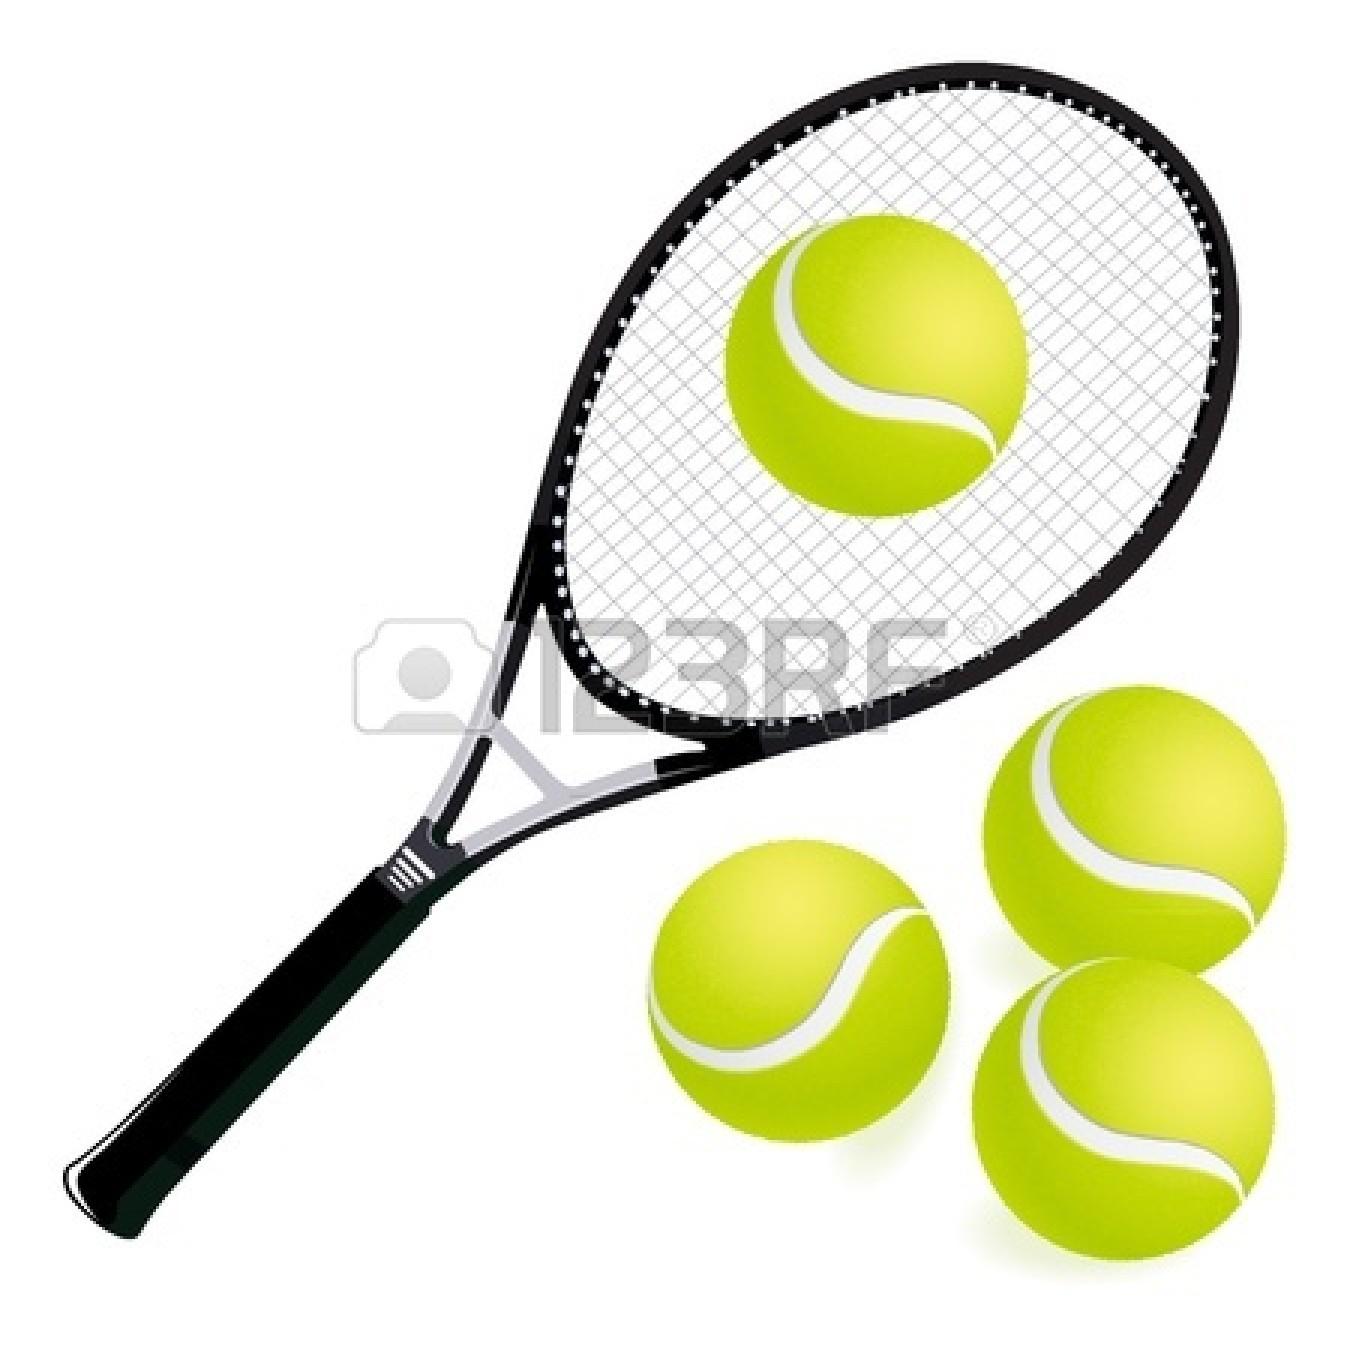 clipart panda tennis - photo #30